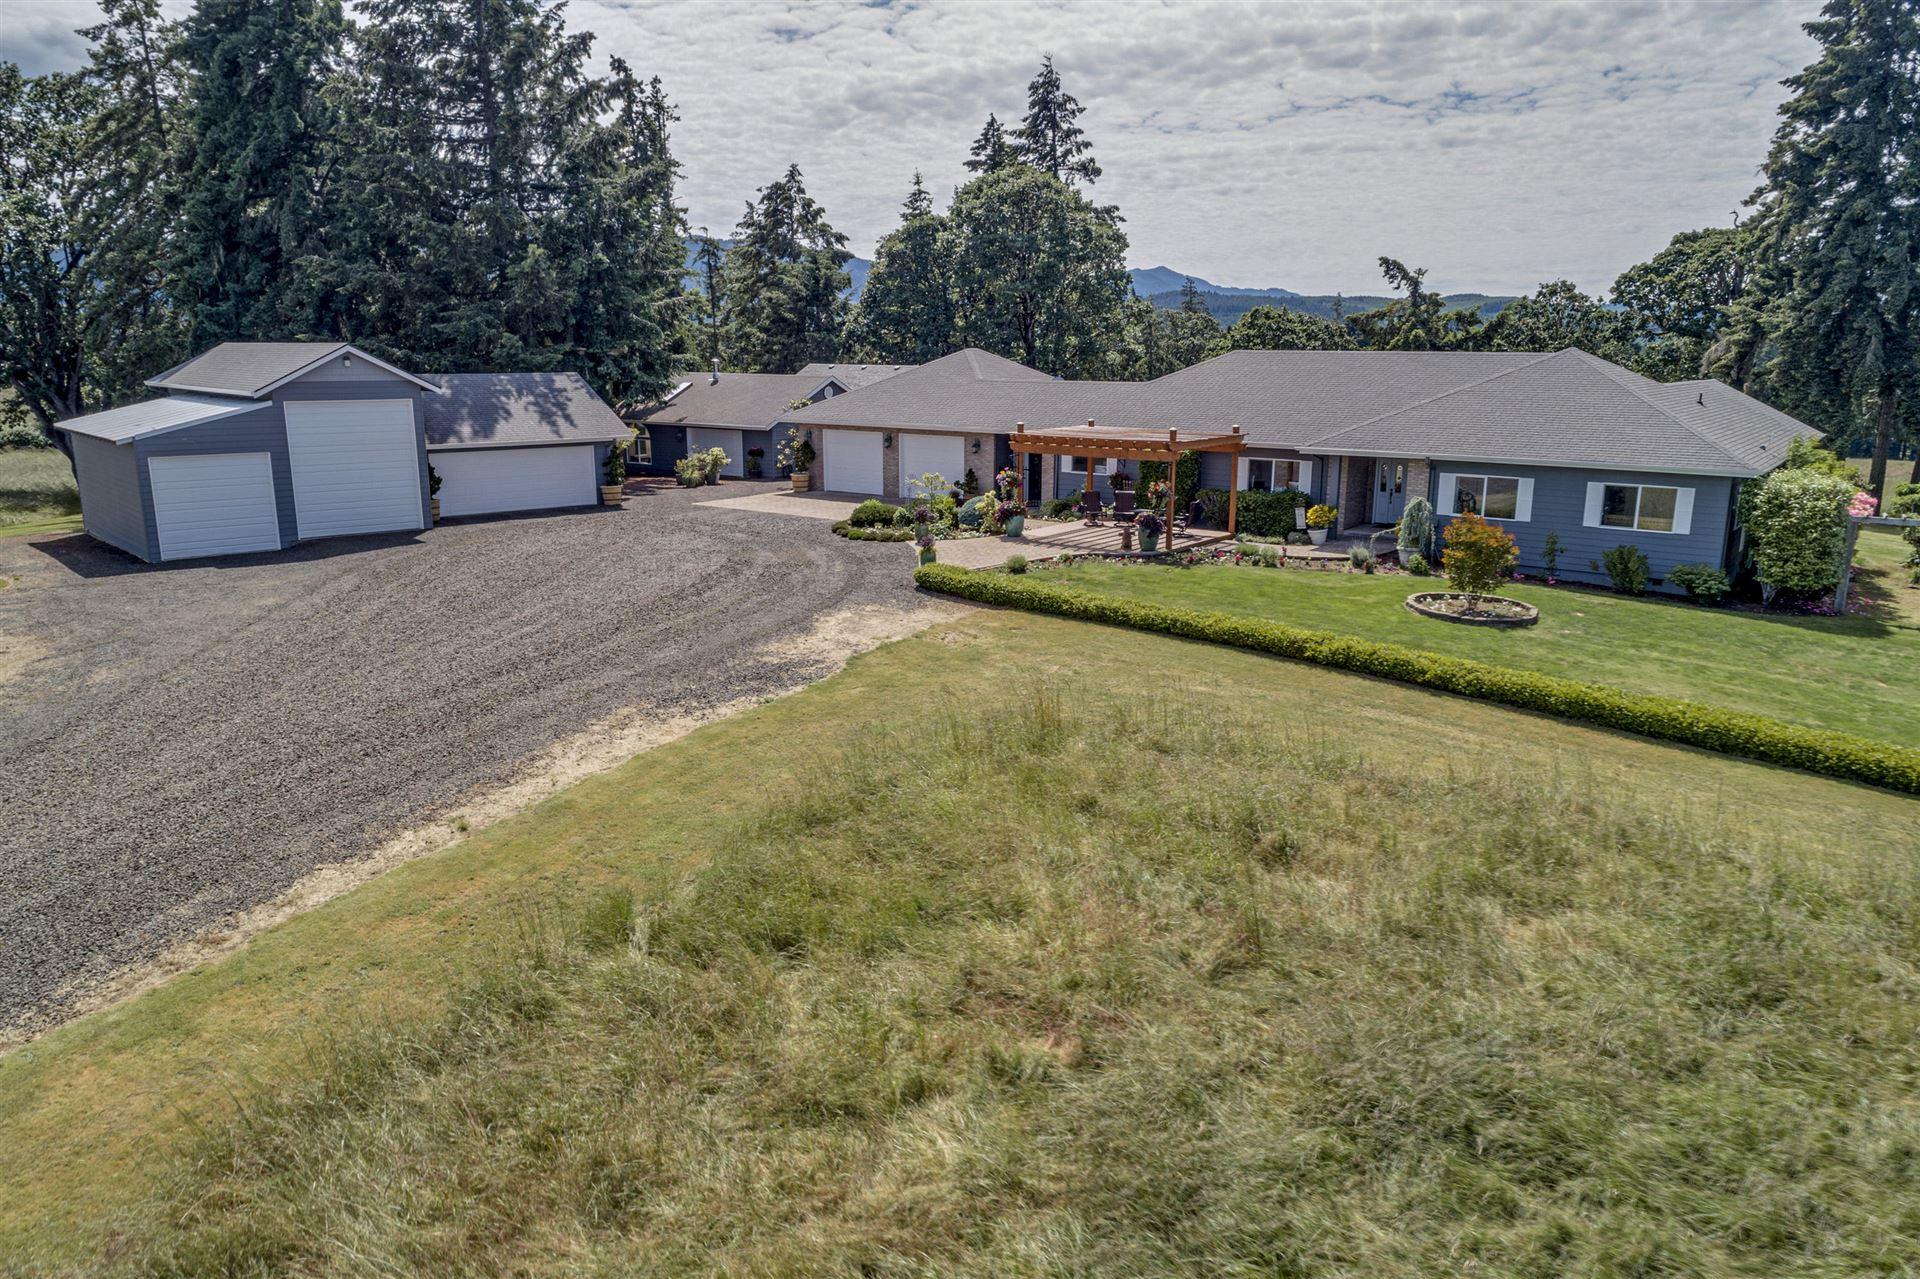 Photo of 18600 Zielinski Road, Sheridan, OR 97378 (MLS # 220120632)